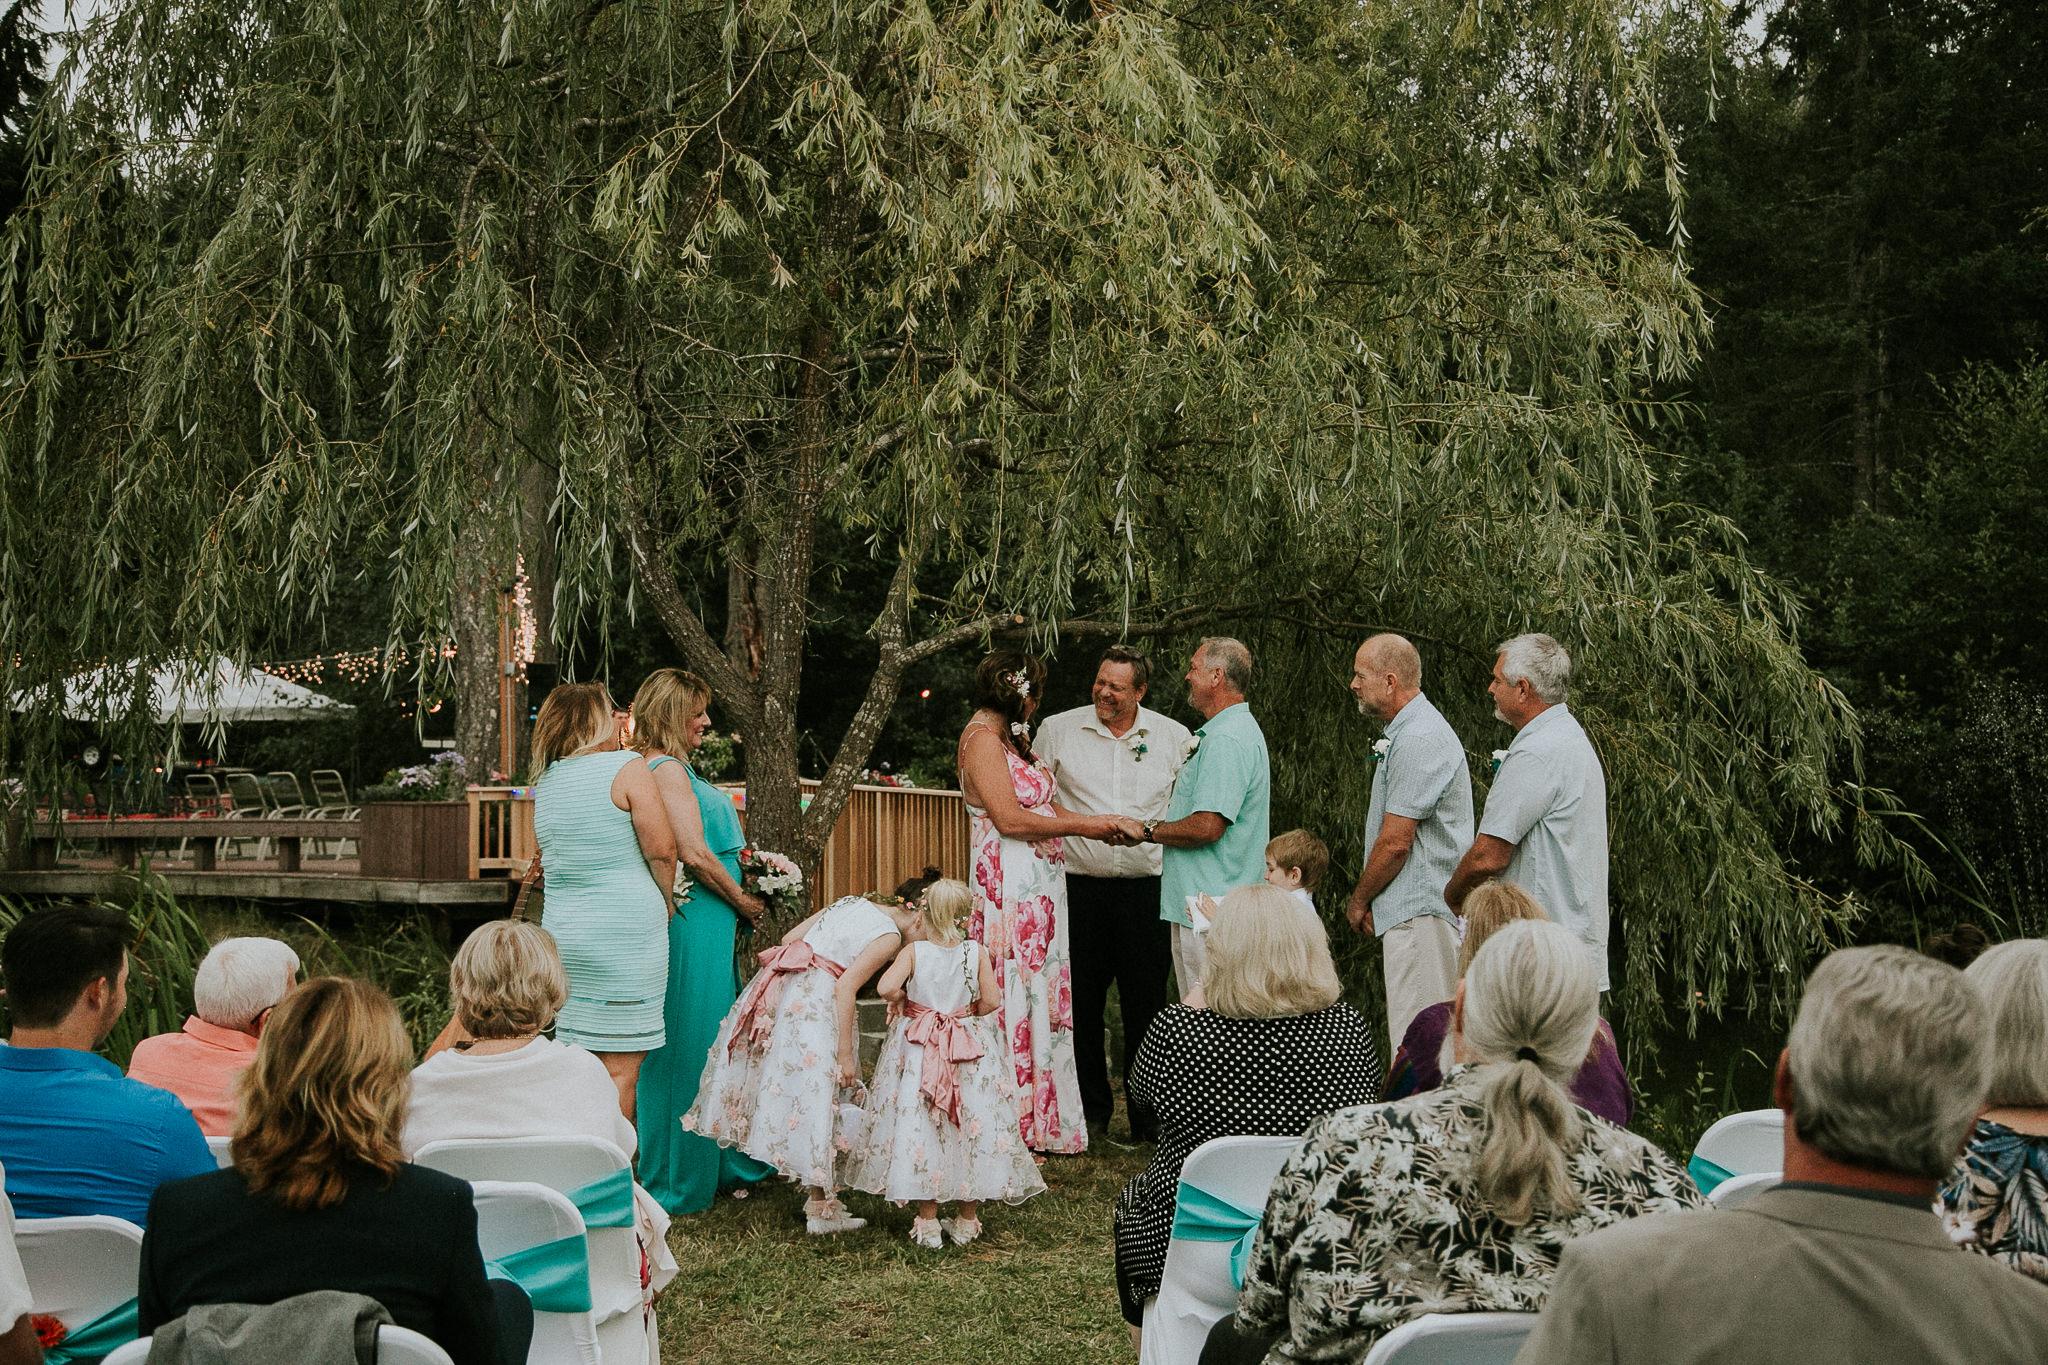 Backyard-Elopement-Ceremony-96.jpg